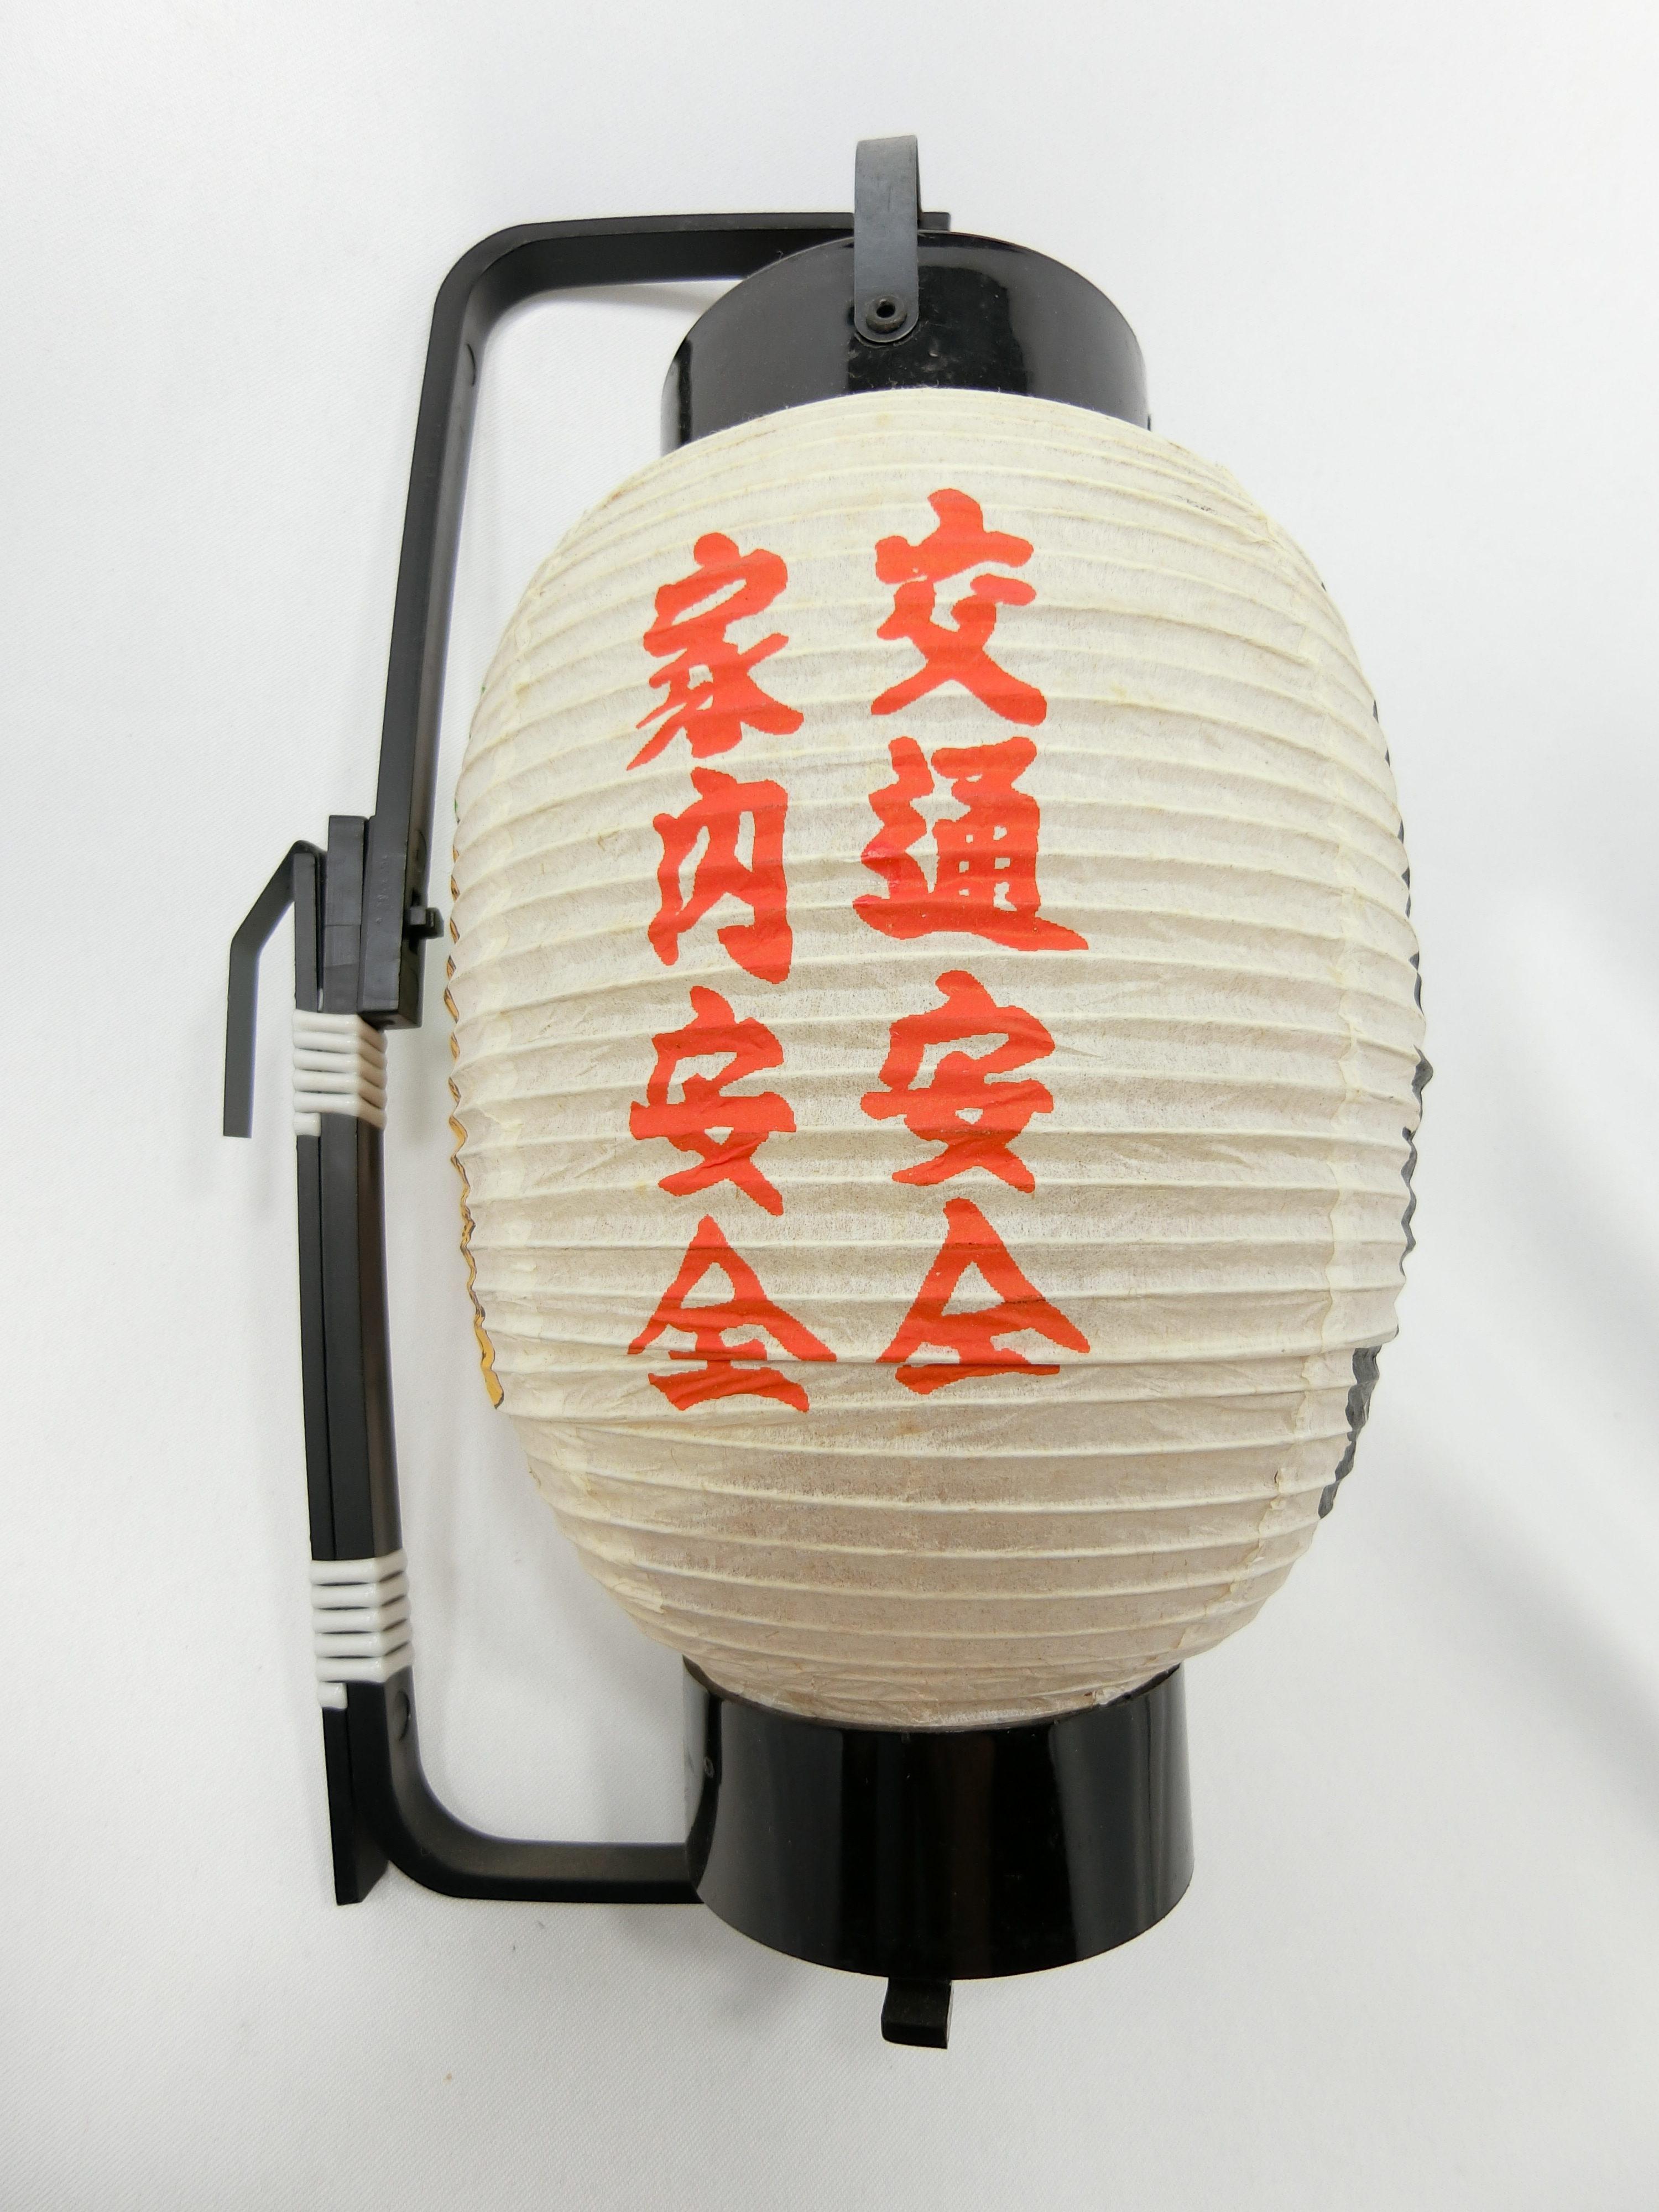 吉見百穴(左)